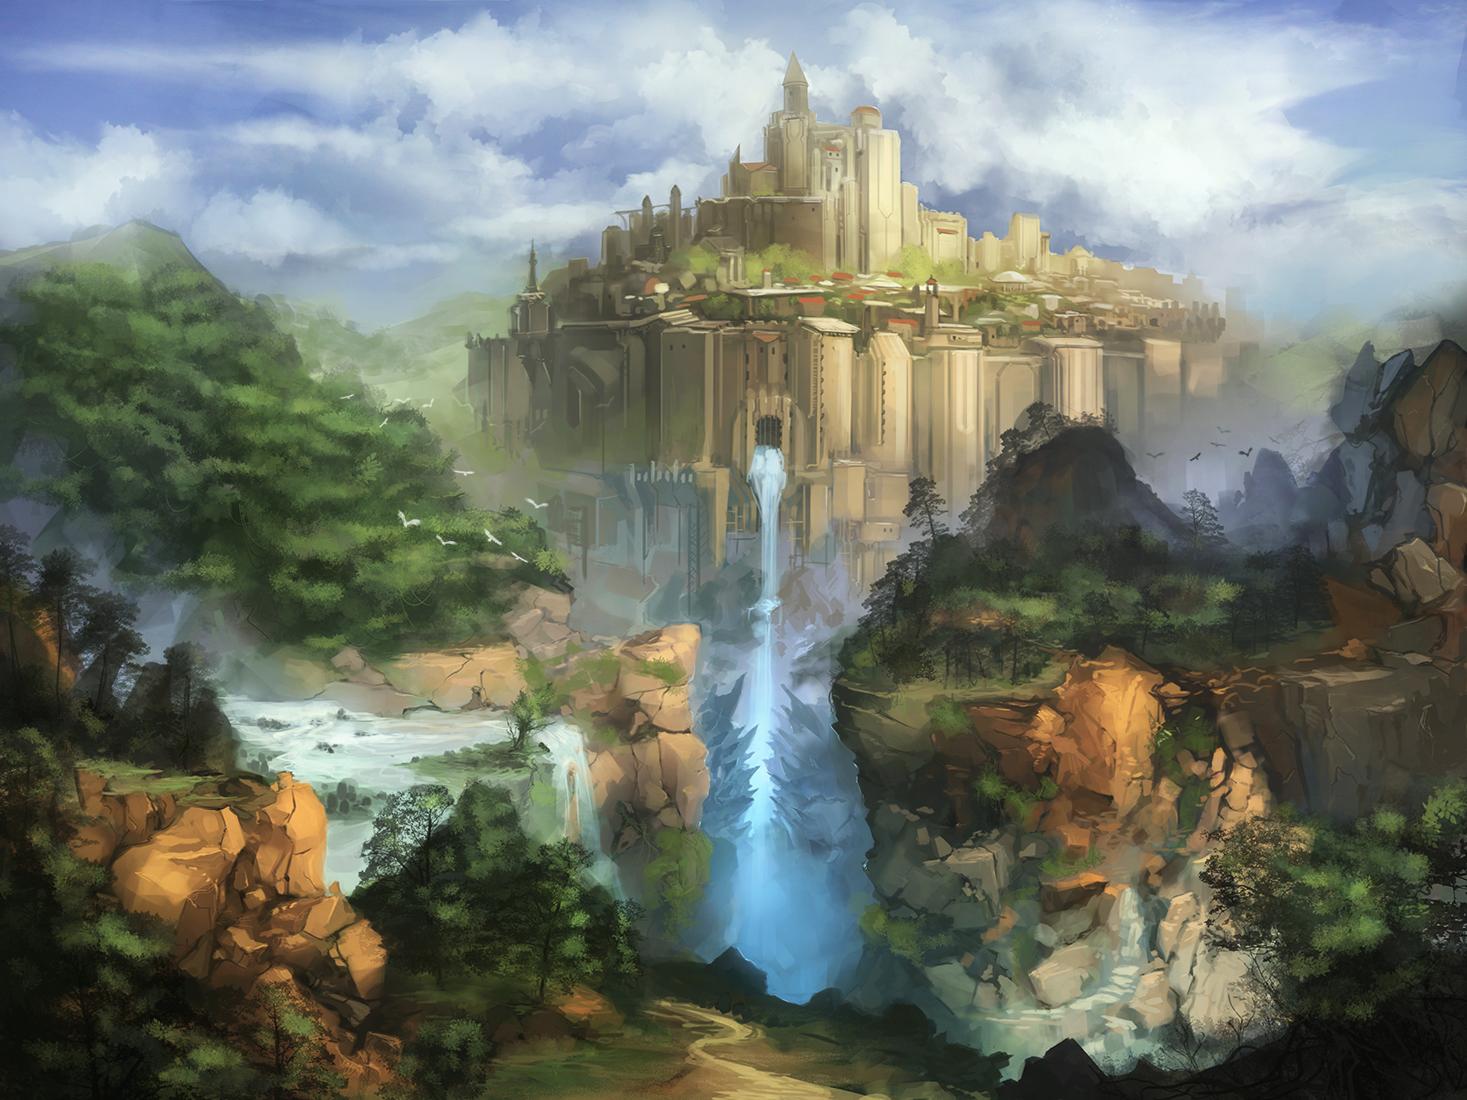 Fantasy castle by N7U2E